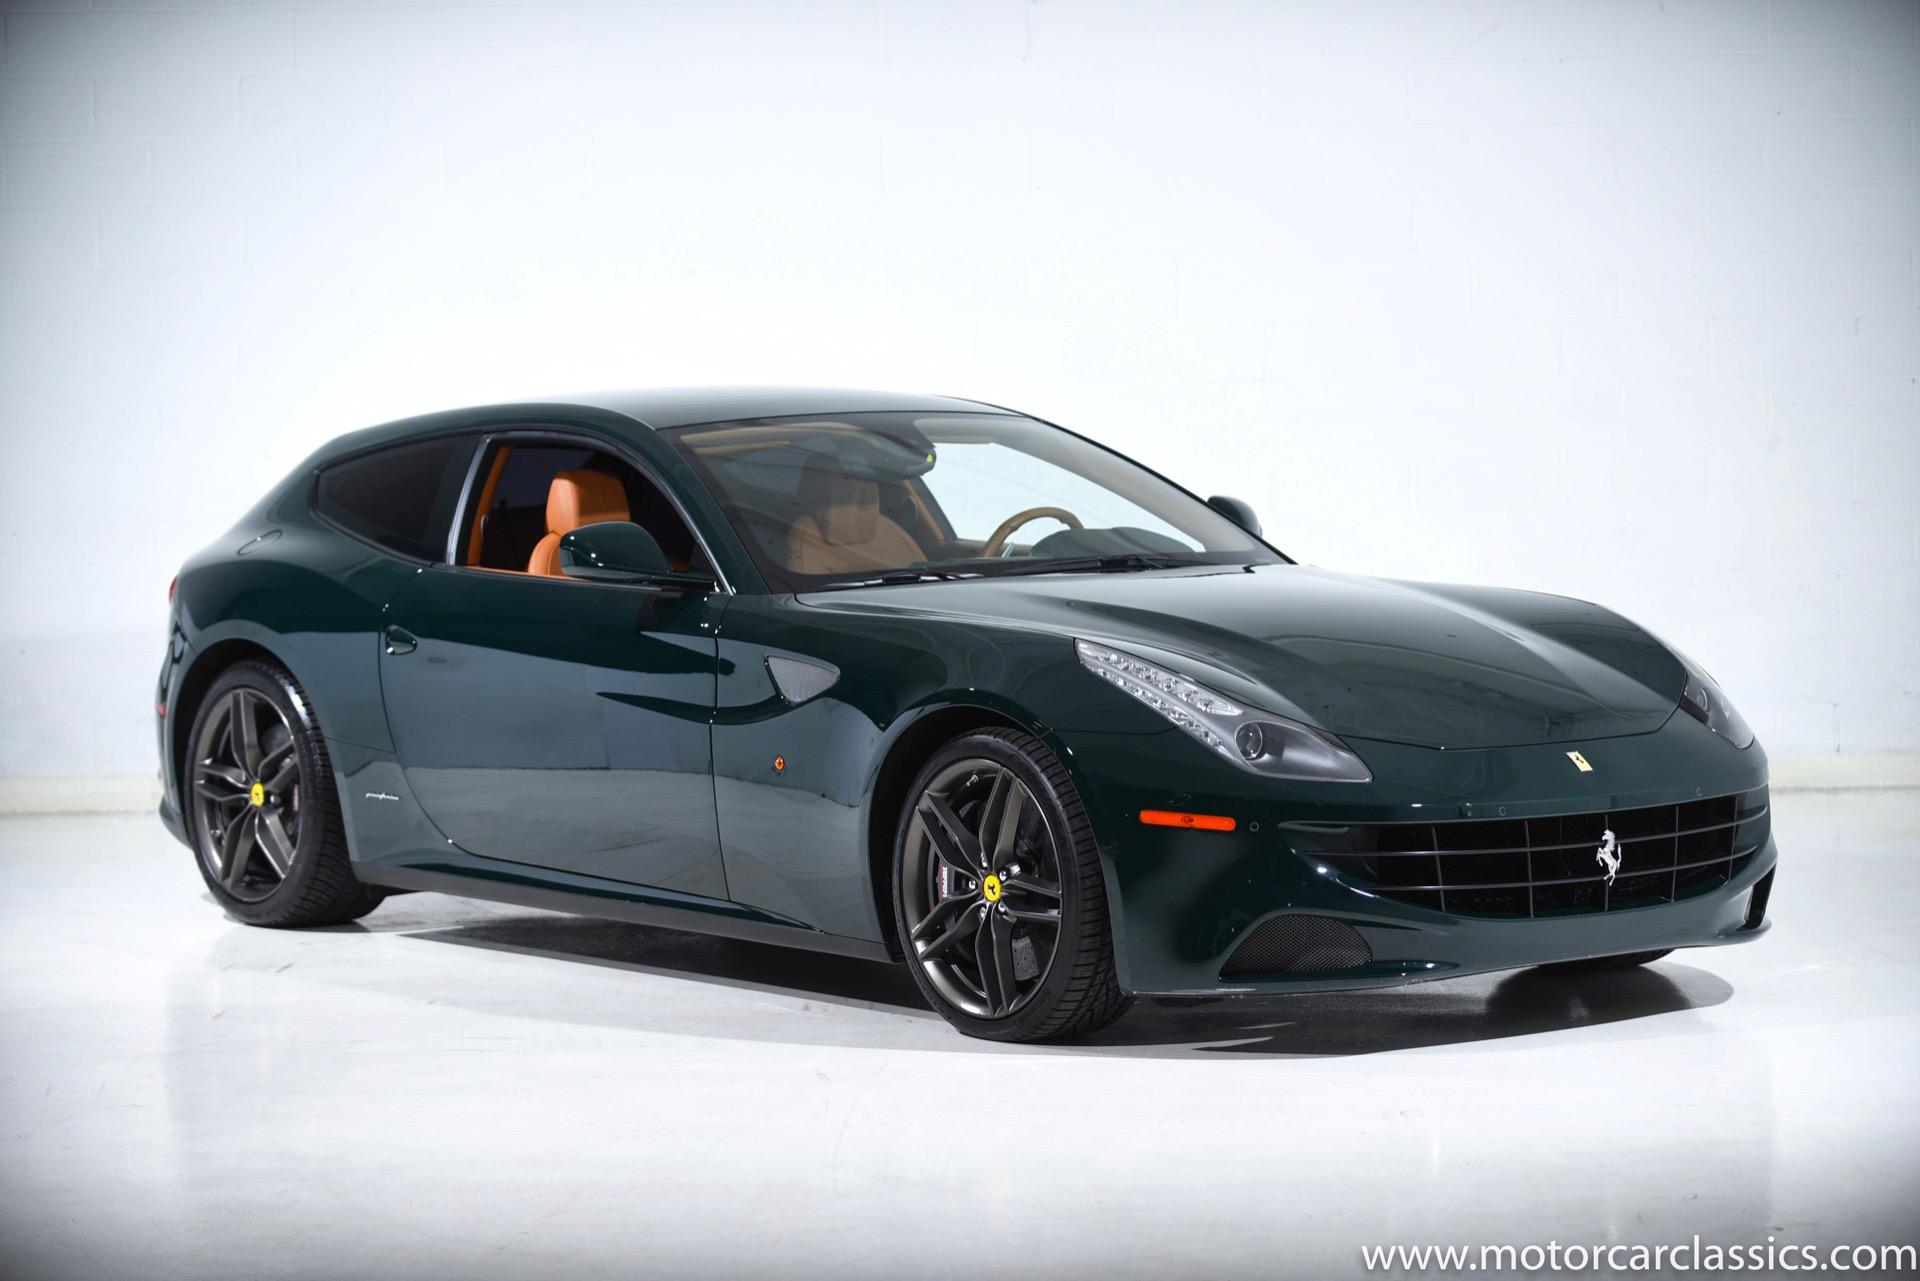 Used 2012 Ferrari Ff For Sale 137900 Motorcar Classics